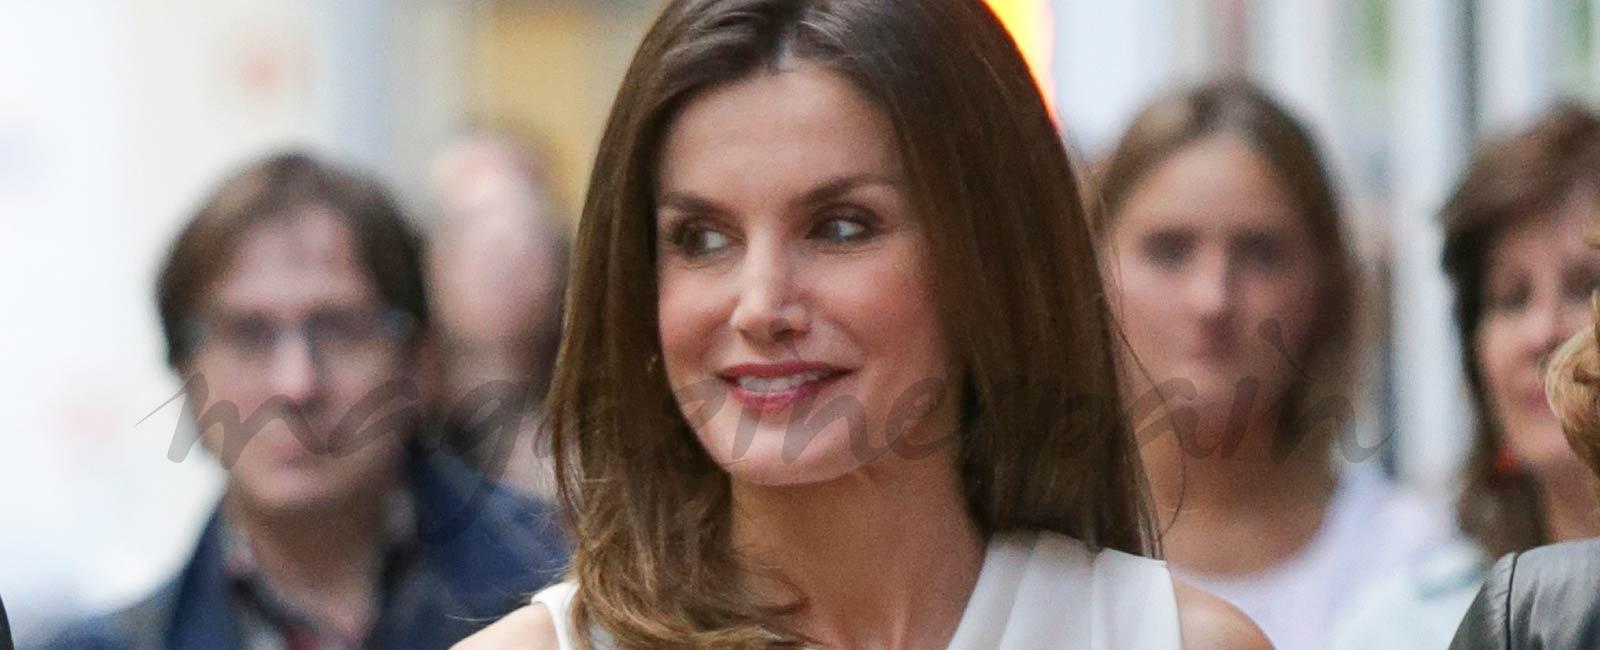 La reina Letizia estrena un look total white muy original